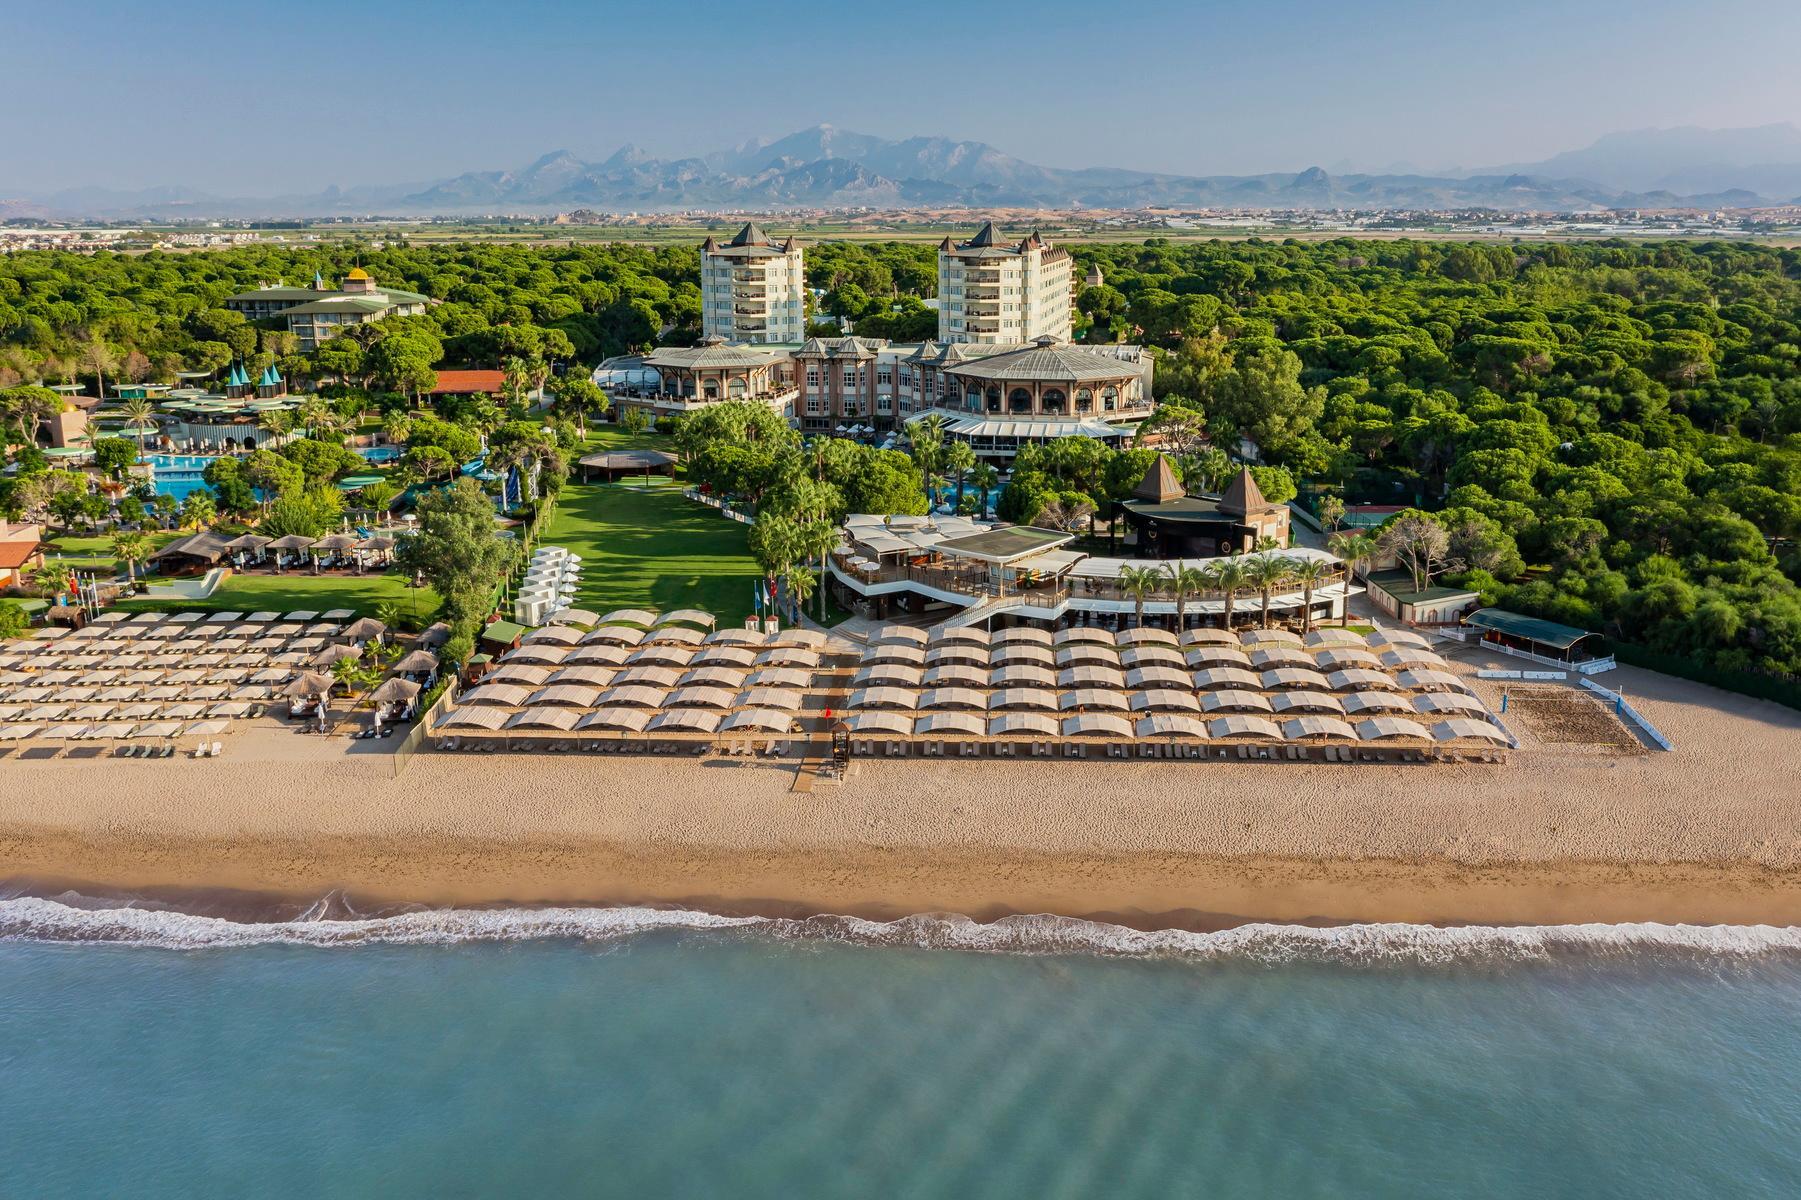 Hotel Cornelia Deluxe Resort, Belek, Antalya, Turcia | Belek, Antalya, Tours